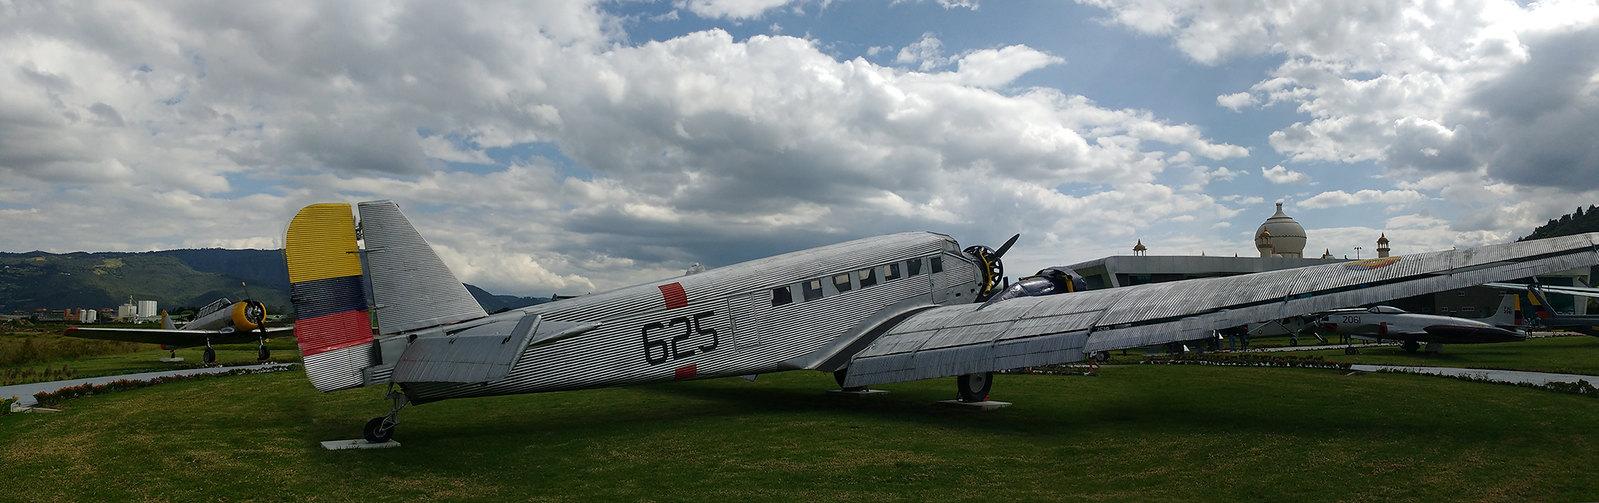 03b. Junkers-Ju-52-3m